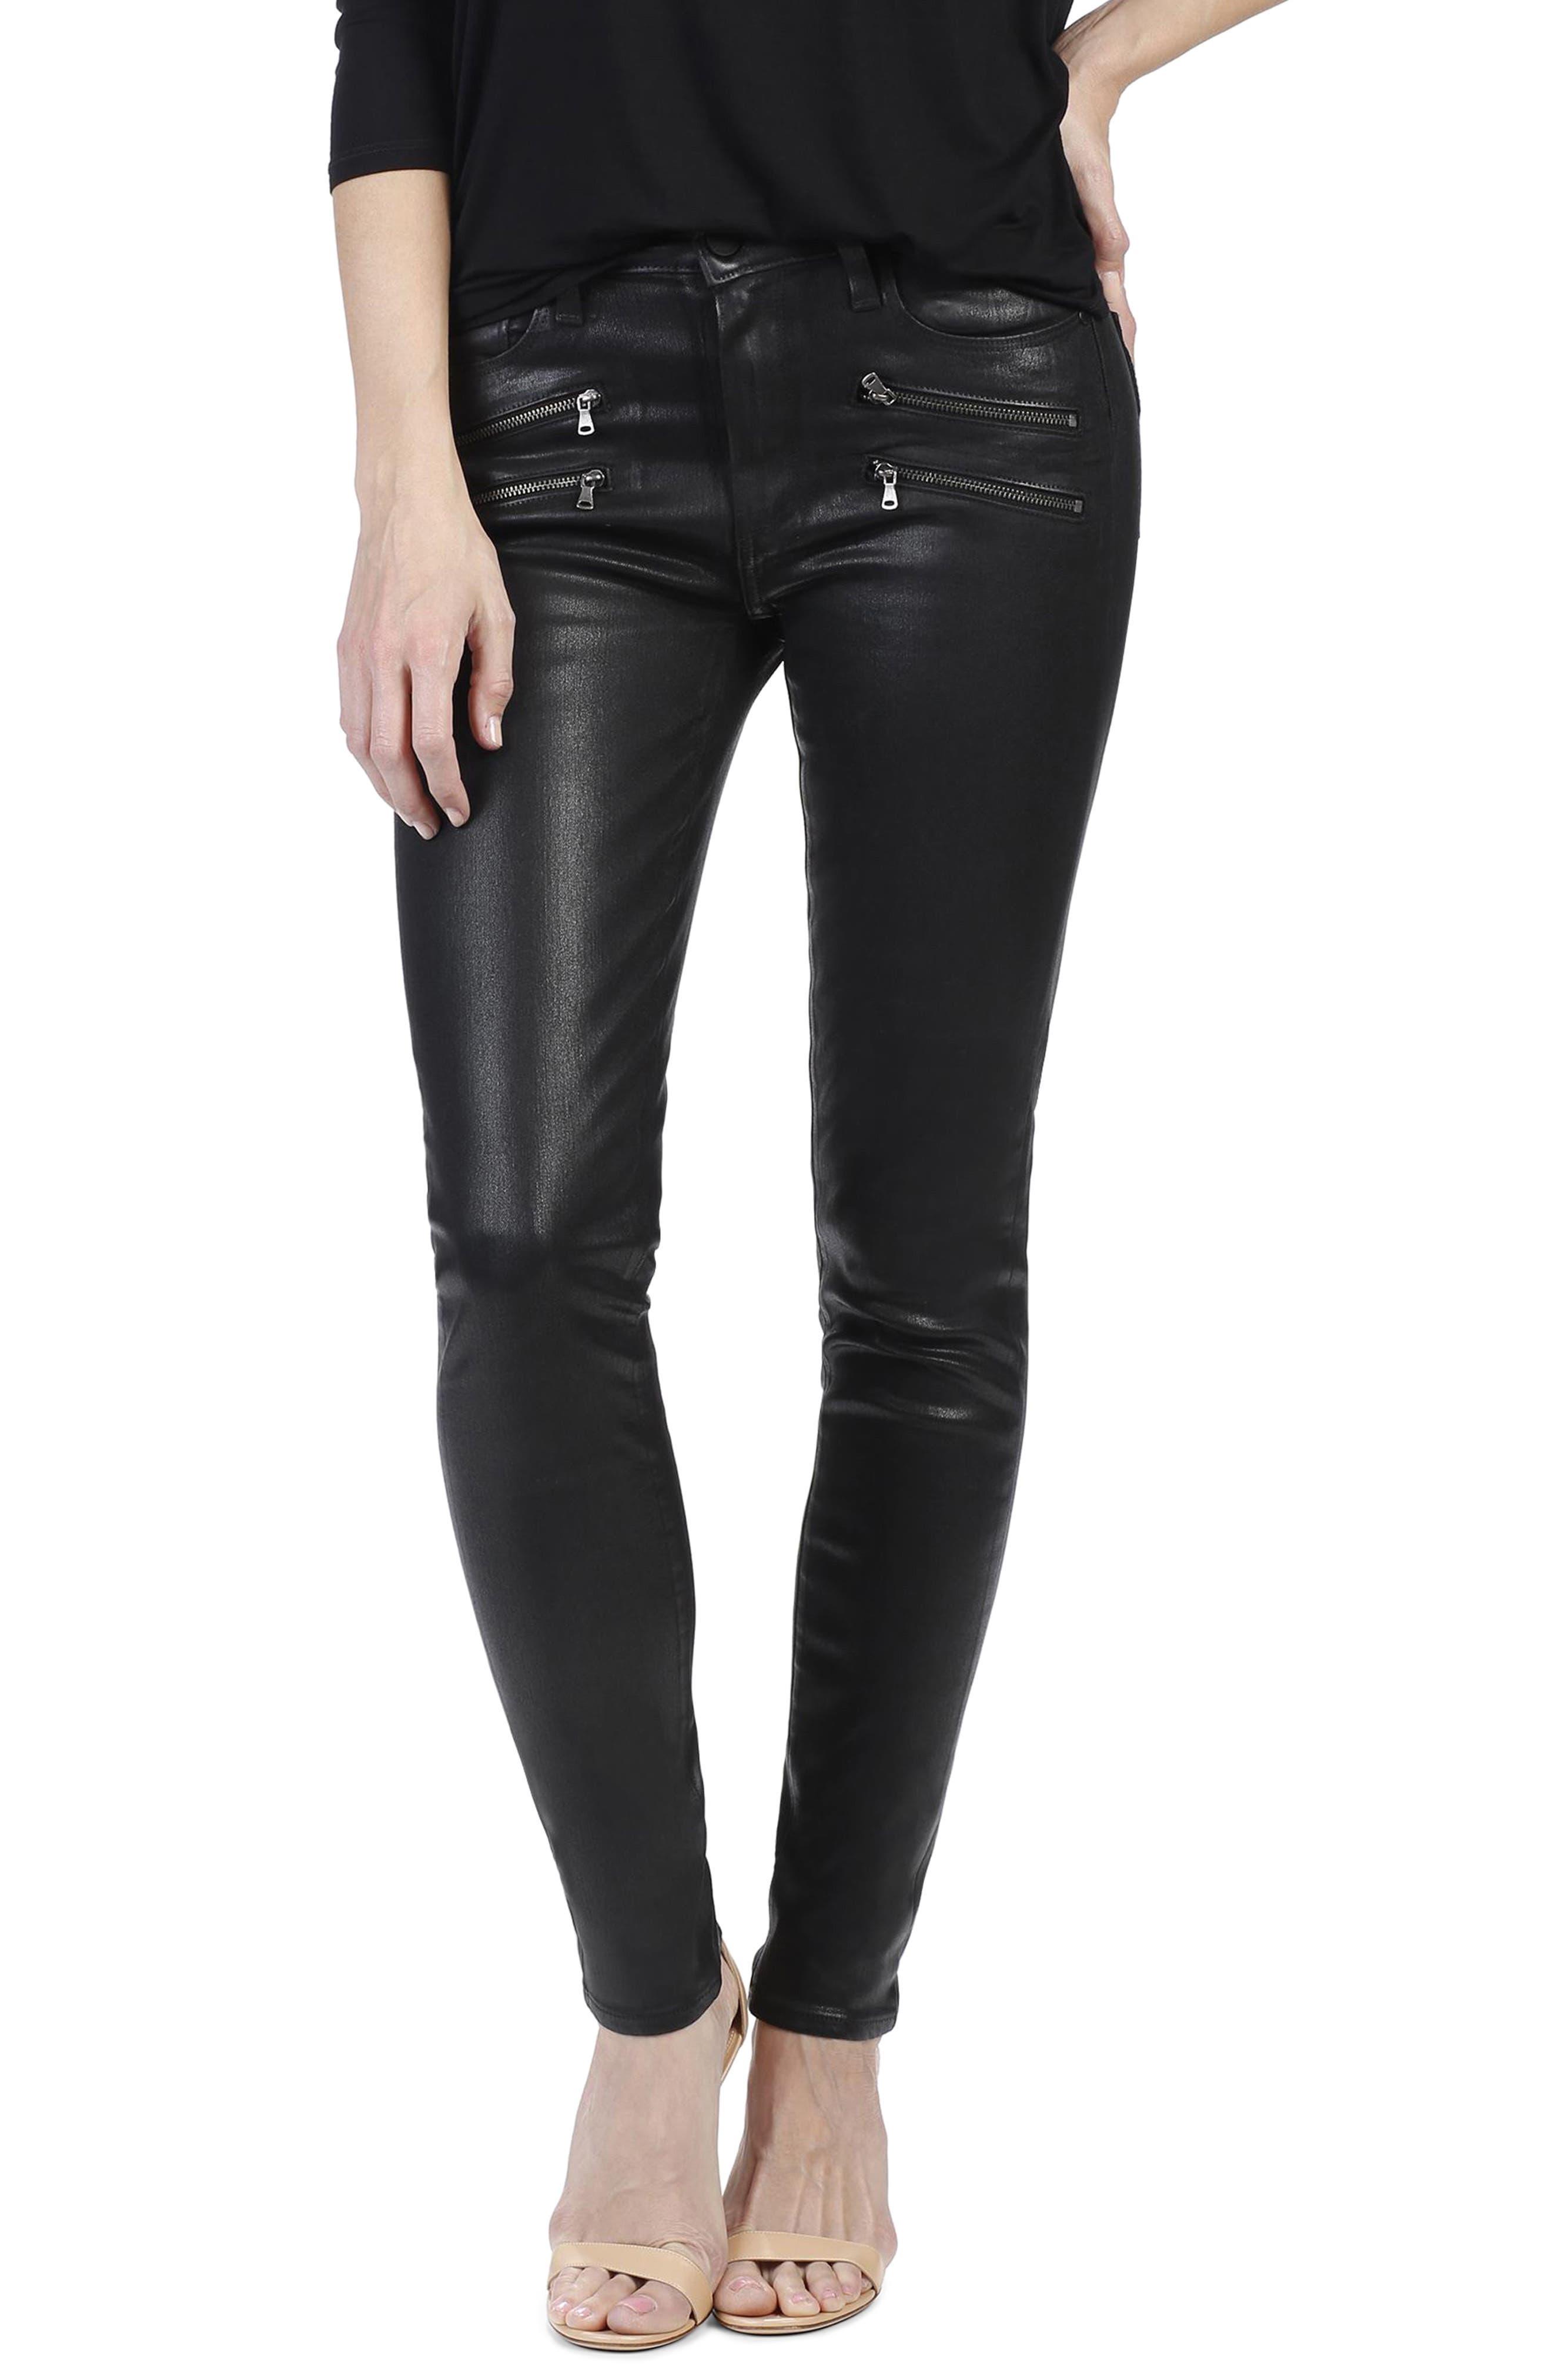 Main Image - PAIGE Edgemont Zip Coated High Waist Ultra Skinny Jeans